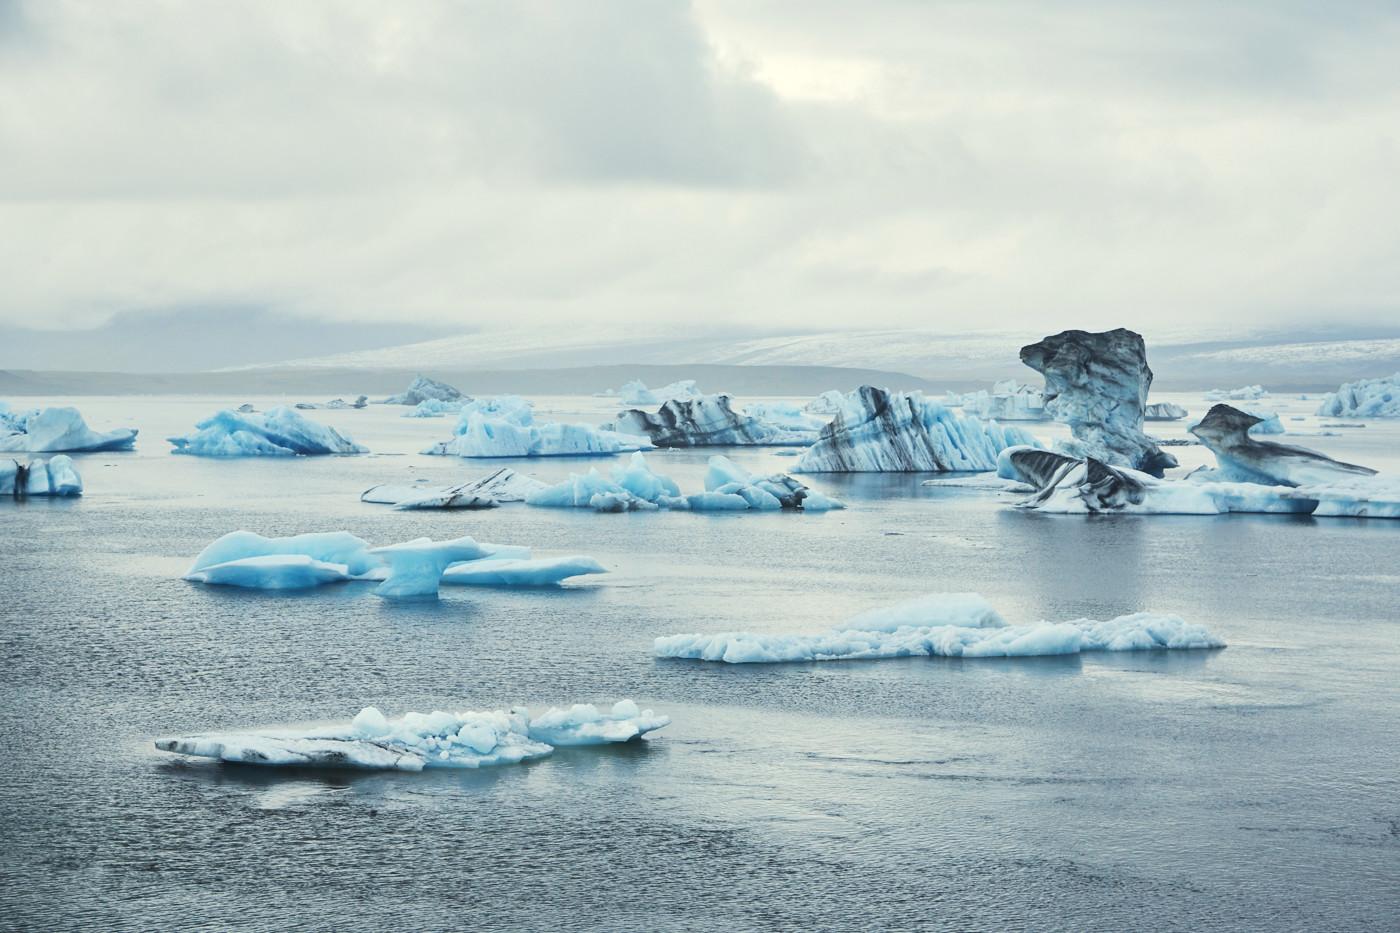 Jökulsárlón, eissee, ice lagoon, ice lake, lagoon, eis, eisschollen, gletschereis, bootstouren, reiseblog, reiseblogger, miles and shores,